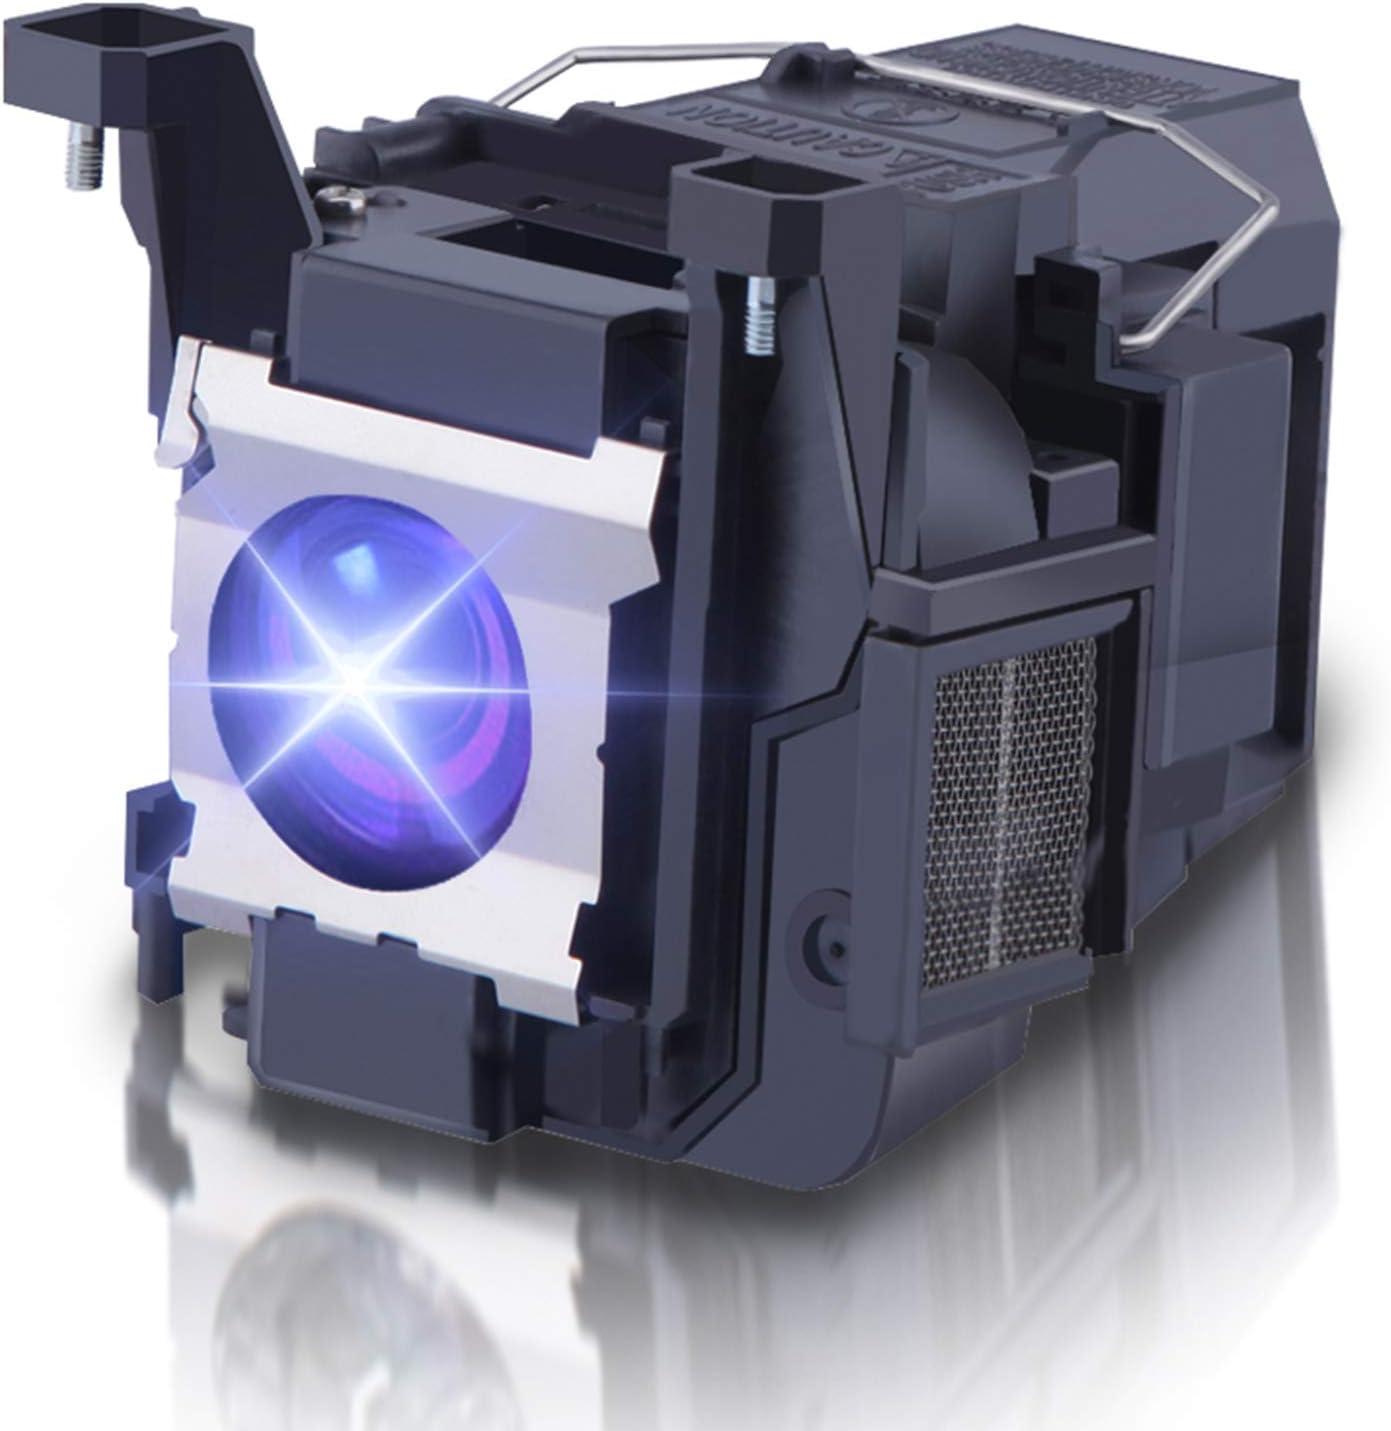 LBTbate ELPLP89 V13H010L89 Replacement Projector Lamp for Epson Powerlite Home Cinema 4010 6040ub 6050ub 5040ube 5050ube EH-TW9300W TW7300 TW8300W H710C H711C H713C H714C H715 epson Projector Bulb